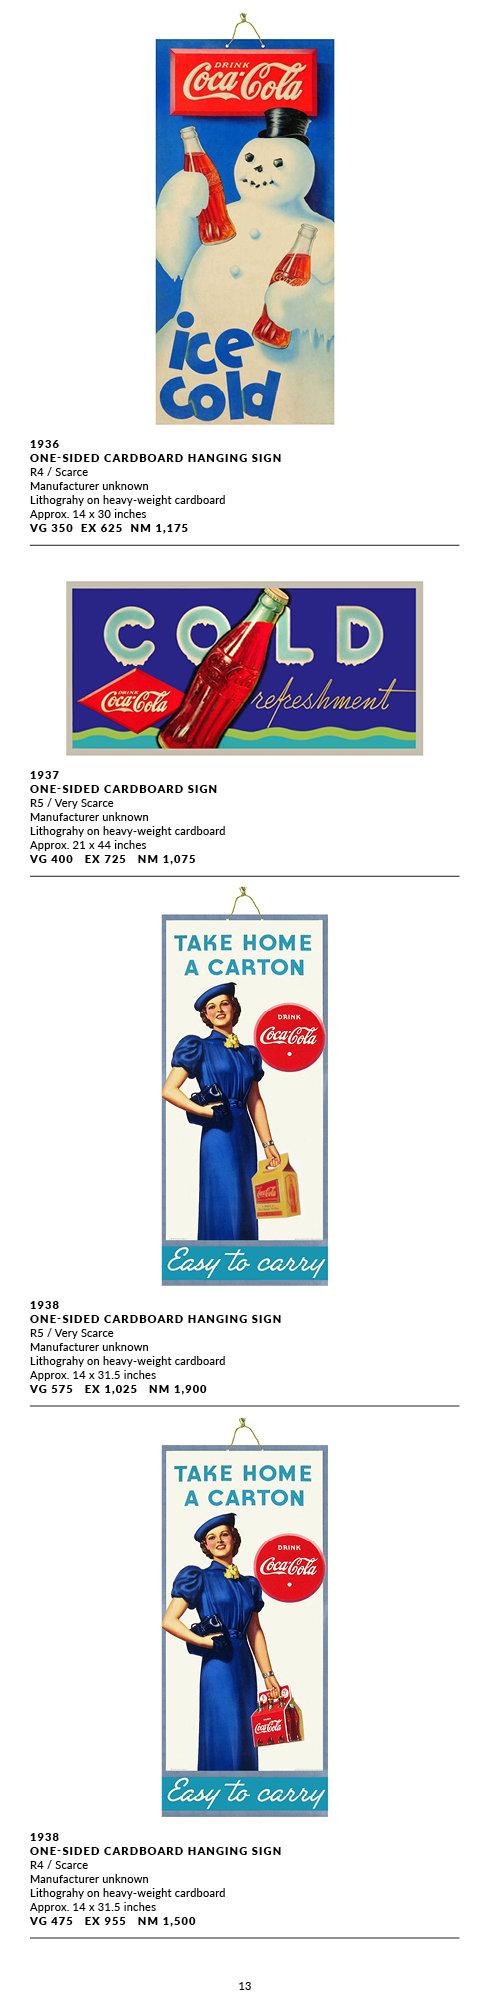 1904-1939RectCardboards (2021)13.jpg